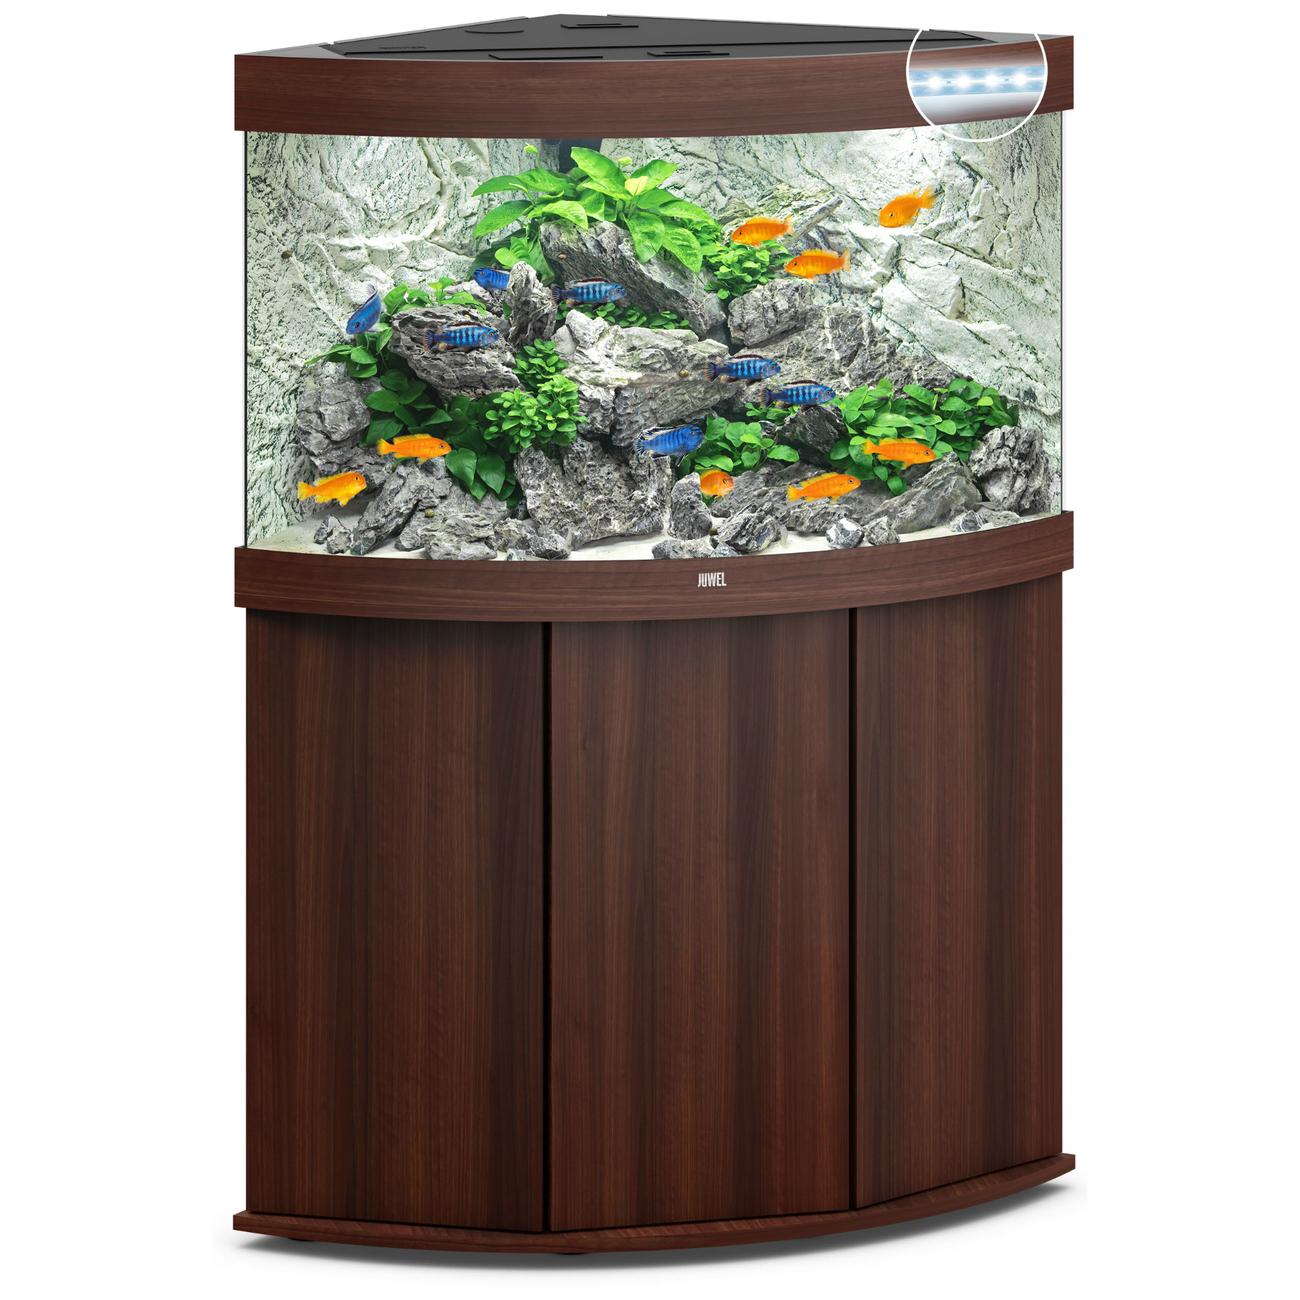 Juwel Trigon 190 LED Eck-Aquarium mit Unterschrank, Bild 15